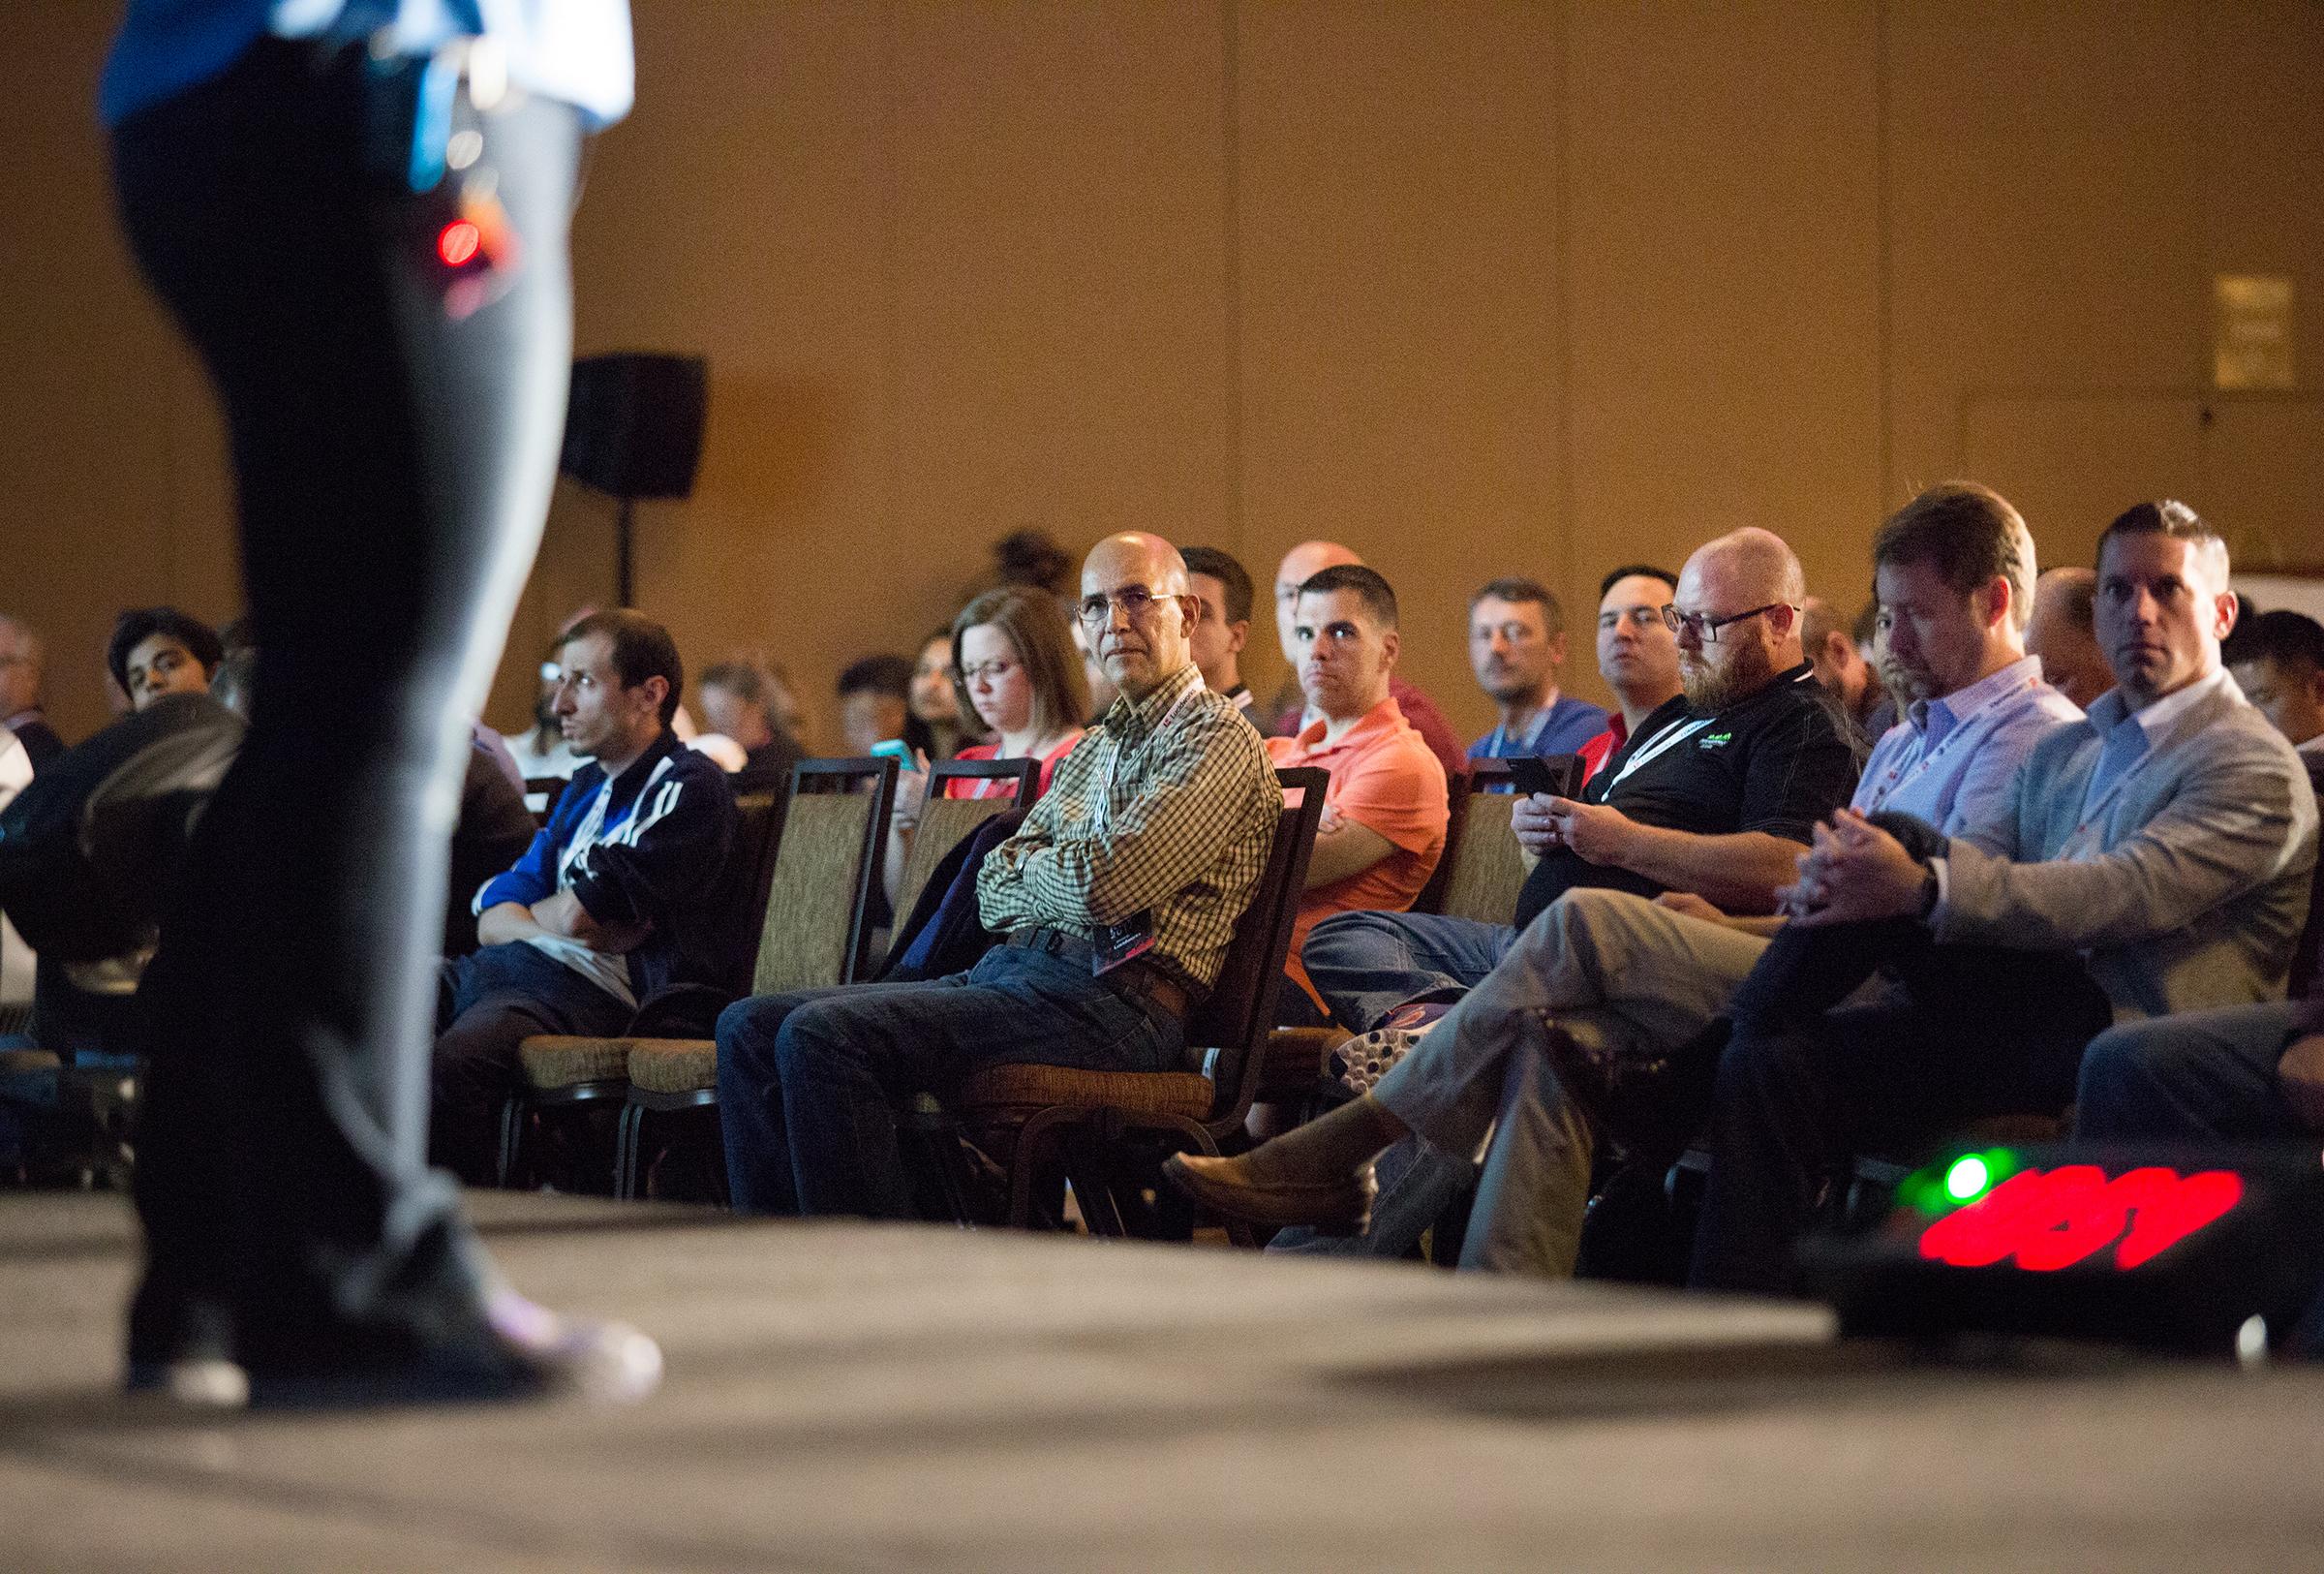 audience_listening-03.jpg